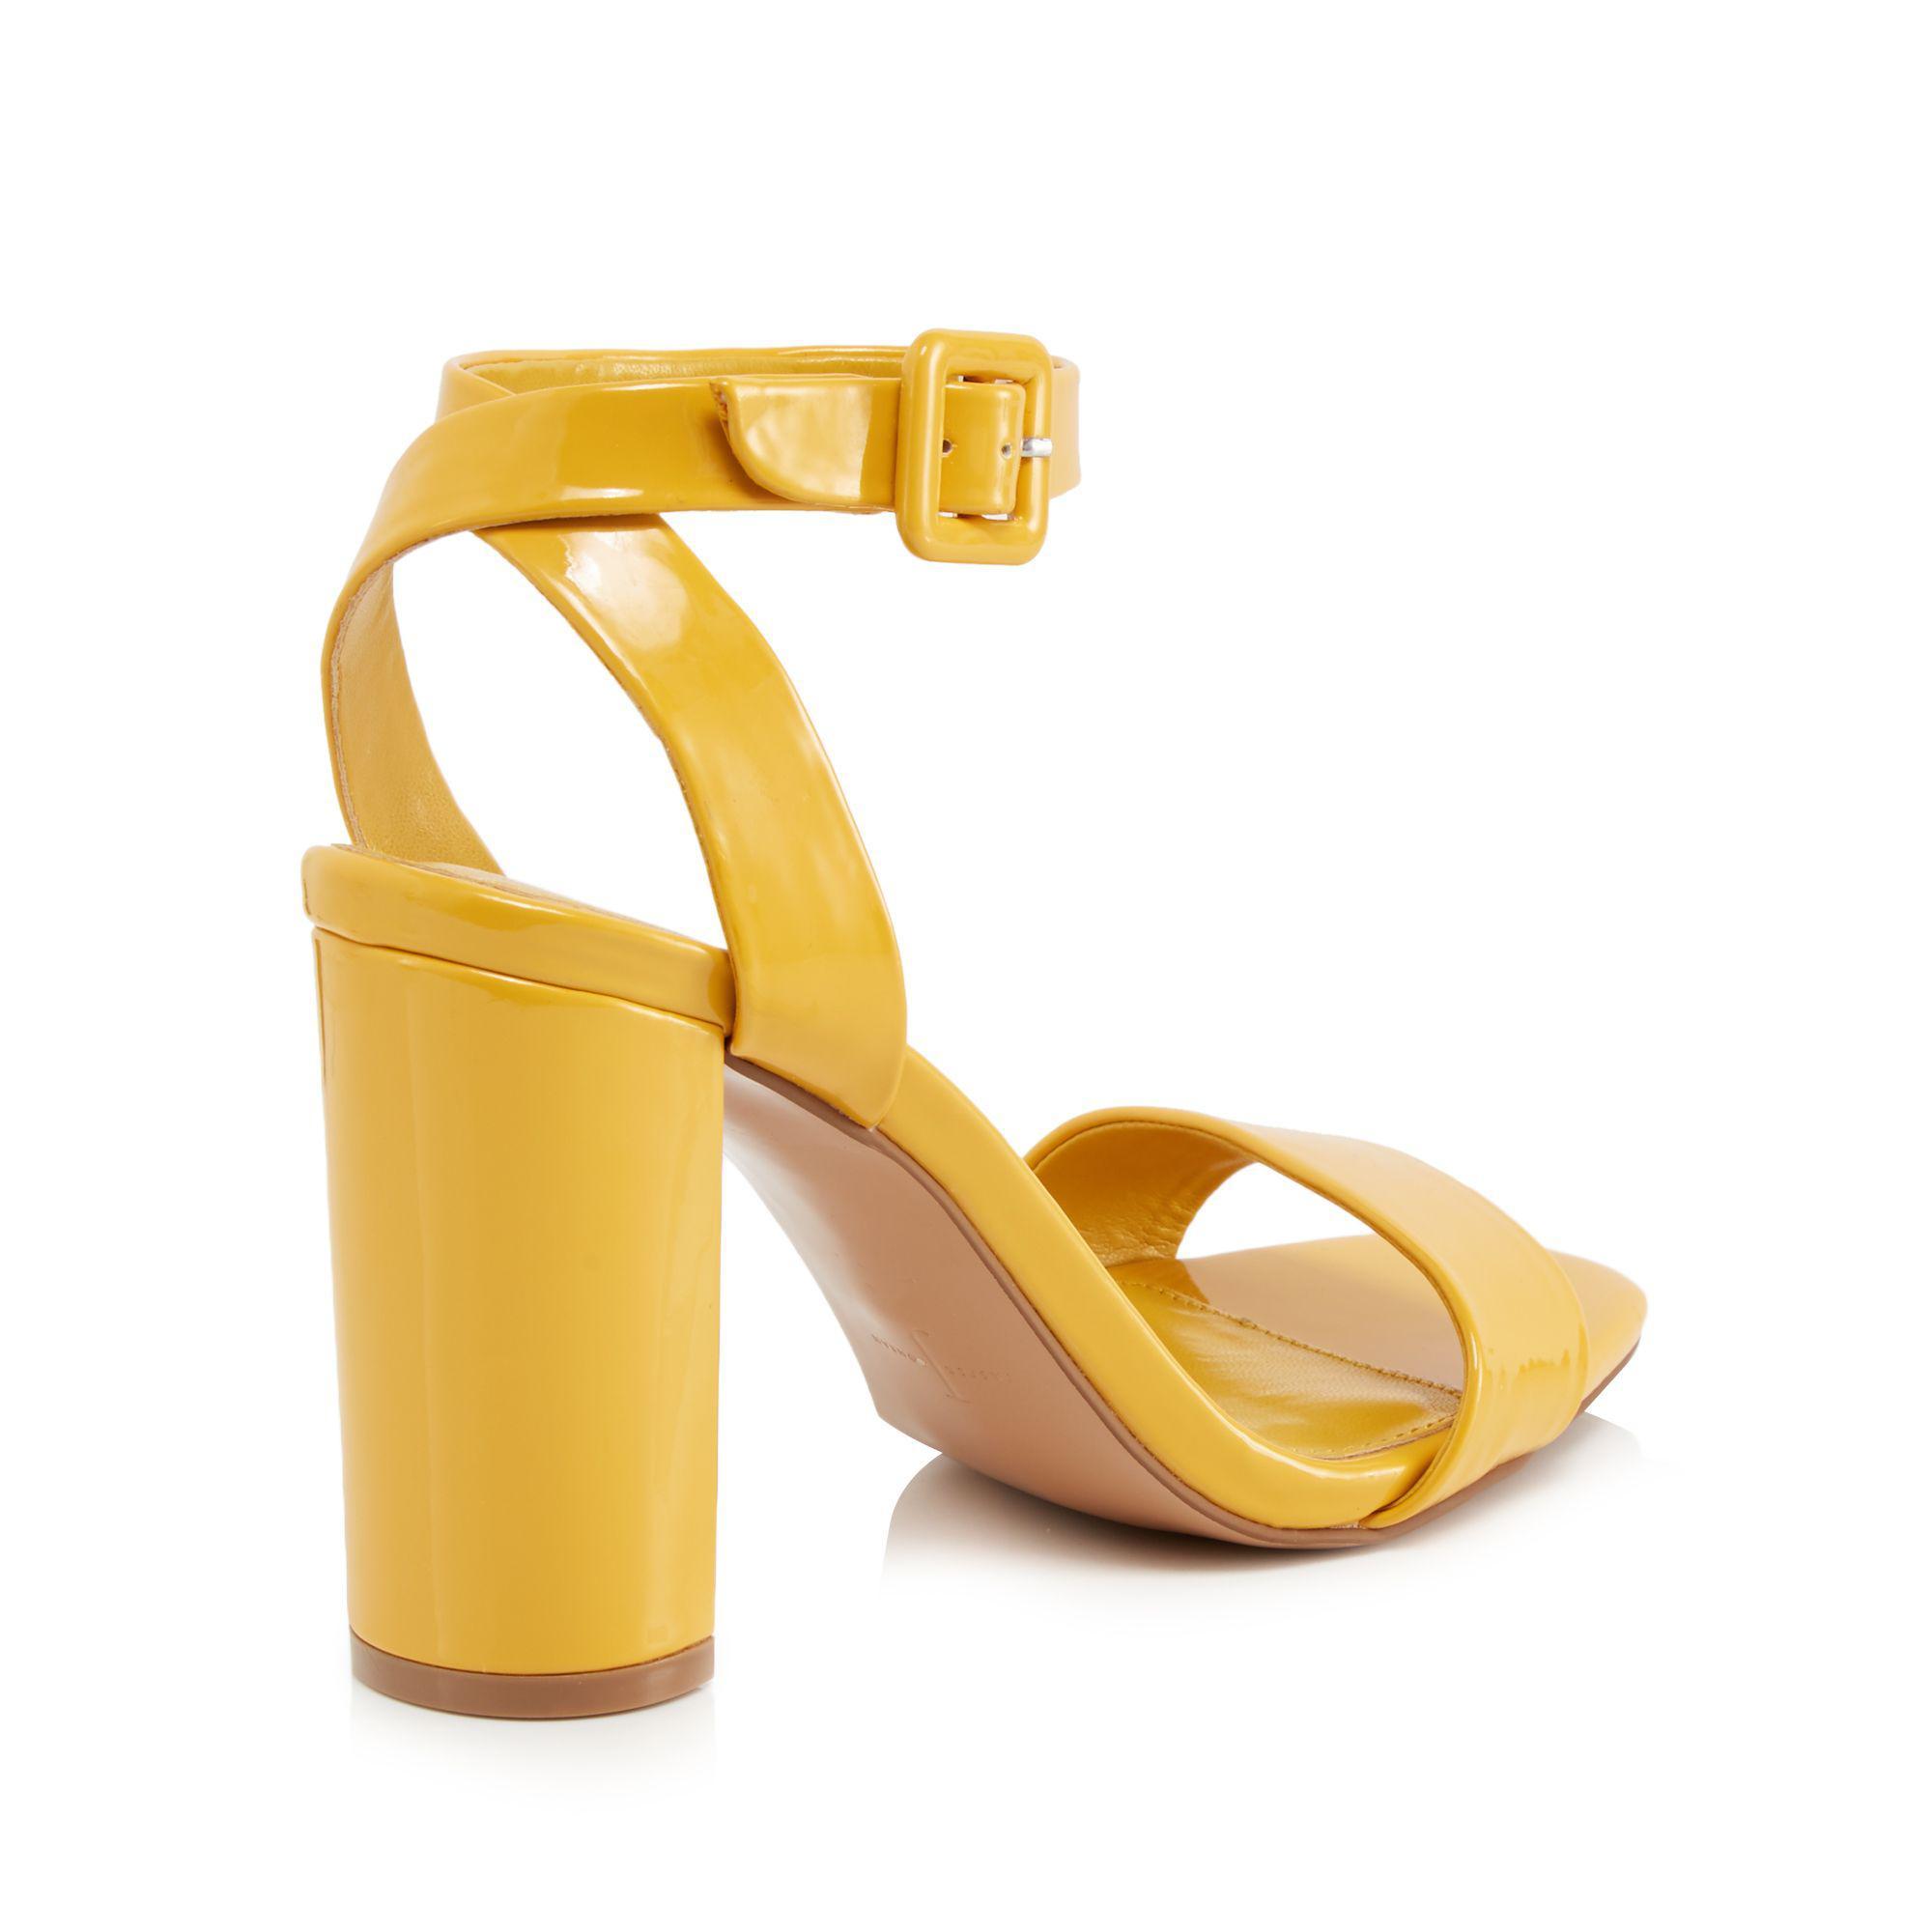 4c7555dfb21d J By Jasper Conran Yellow Patent  jessica  High Block Heel Ankle ...